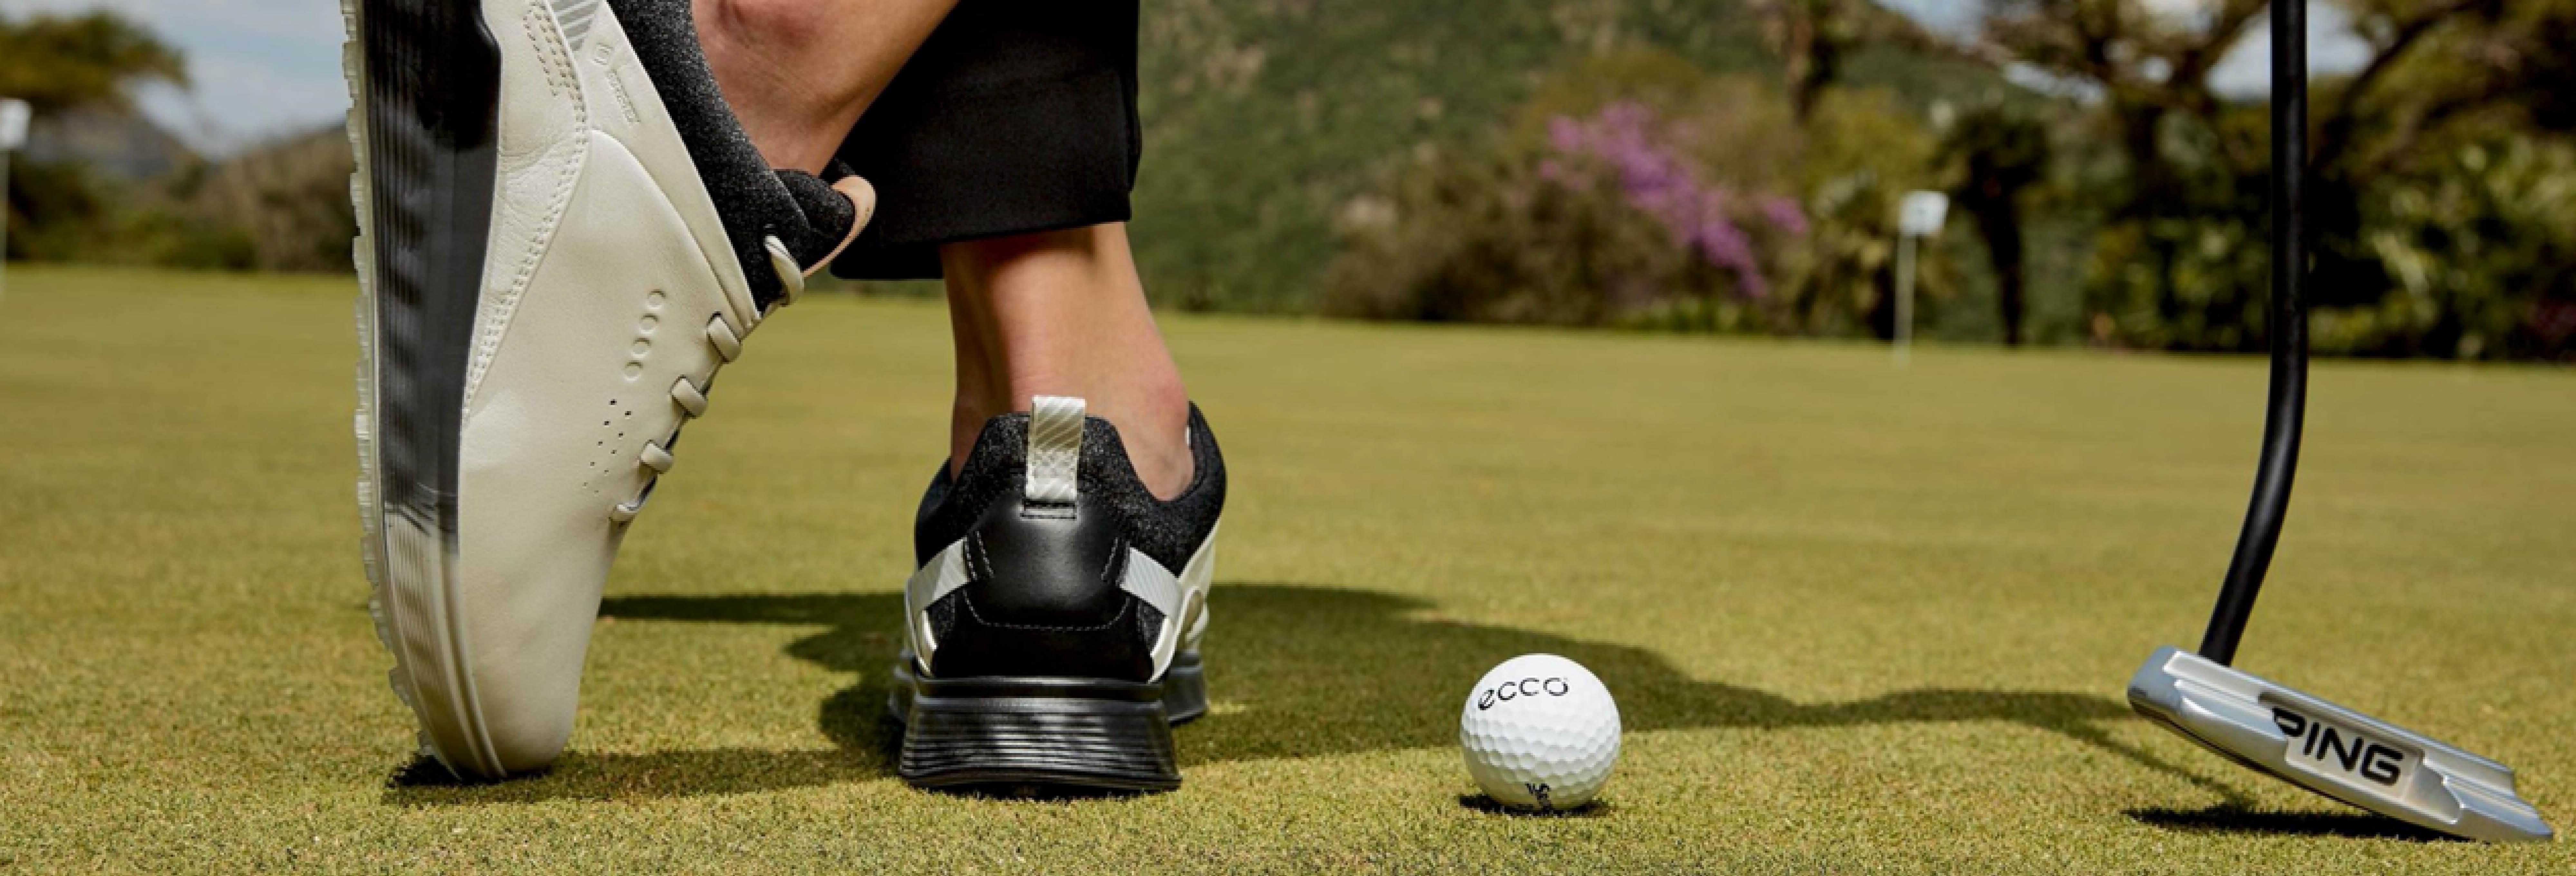 Golfsucces